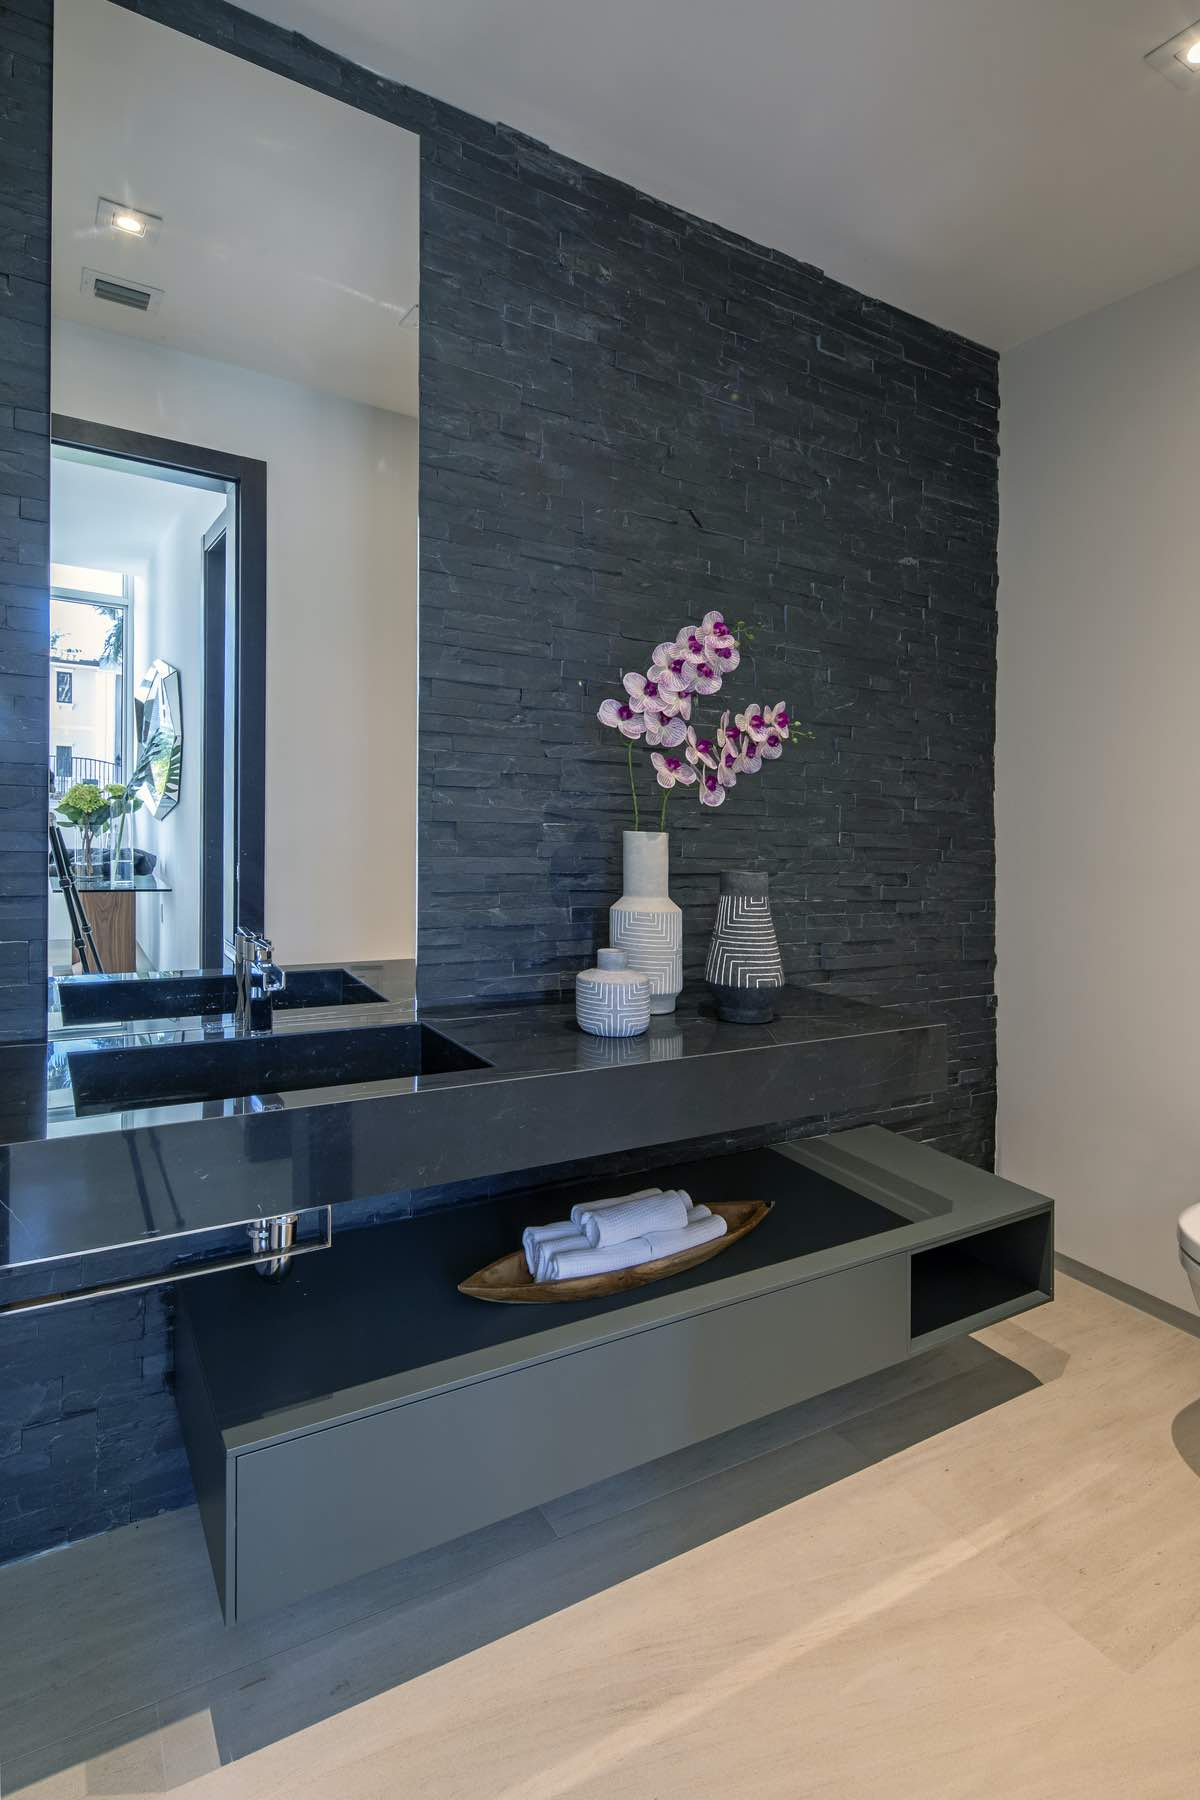 washing basin made of black marble